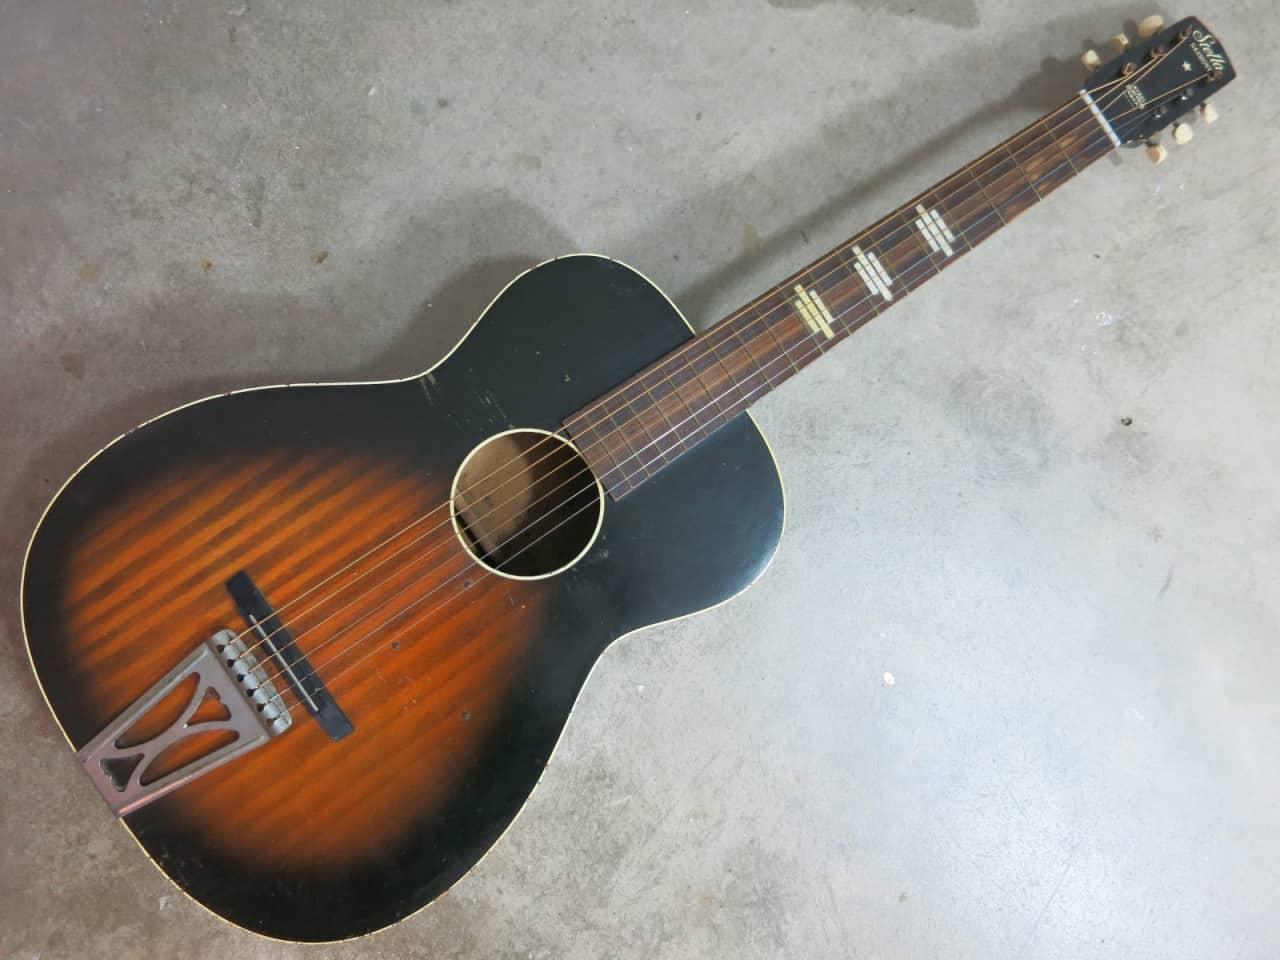 vintage 1960s harmony stella acoustic parlor guitar made in reverb. Black Bedroom Furniture Sets. Home Design Ideas